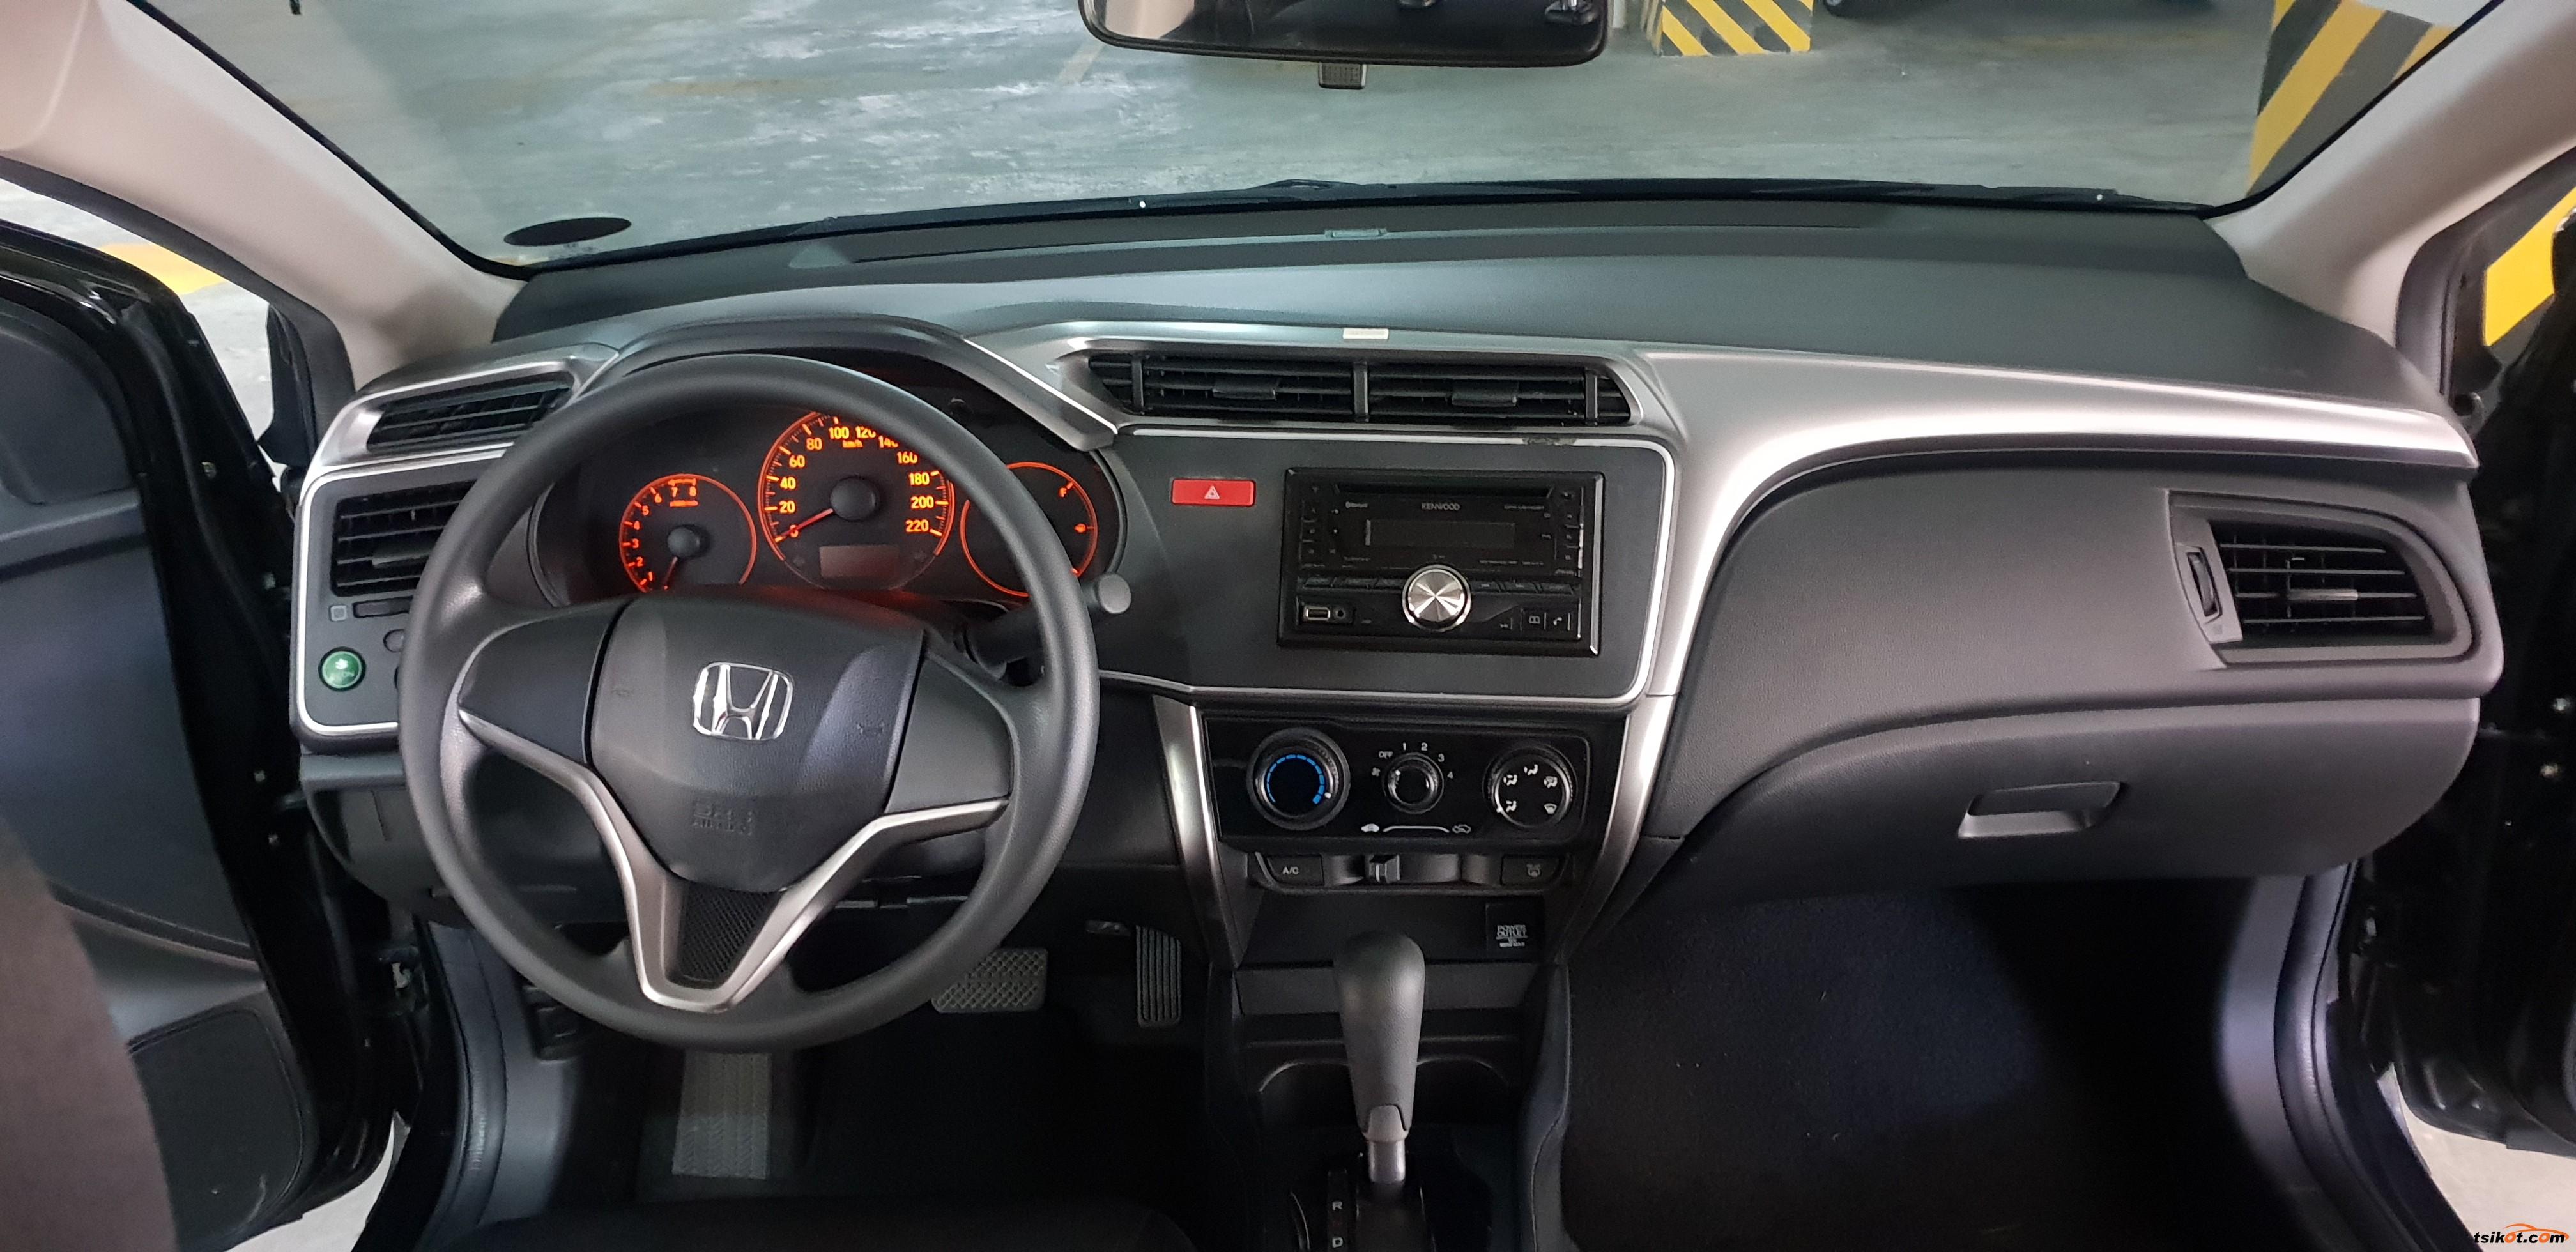 Honda City 2017 - 3